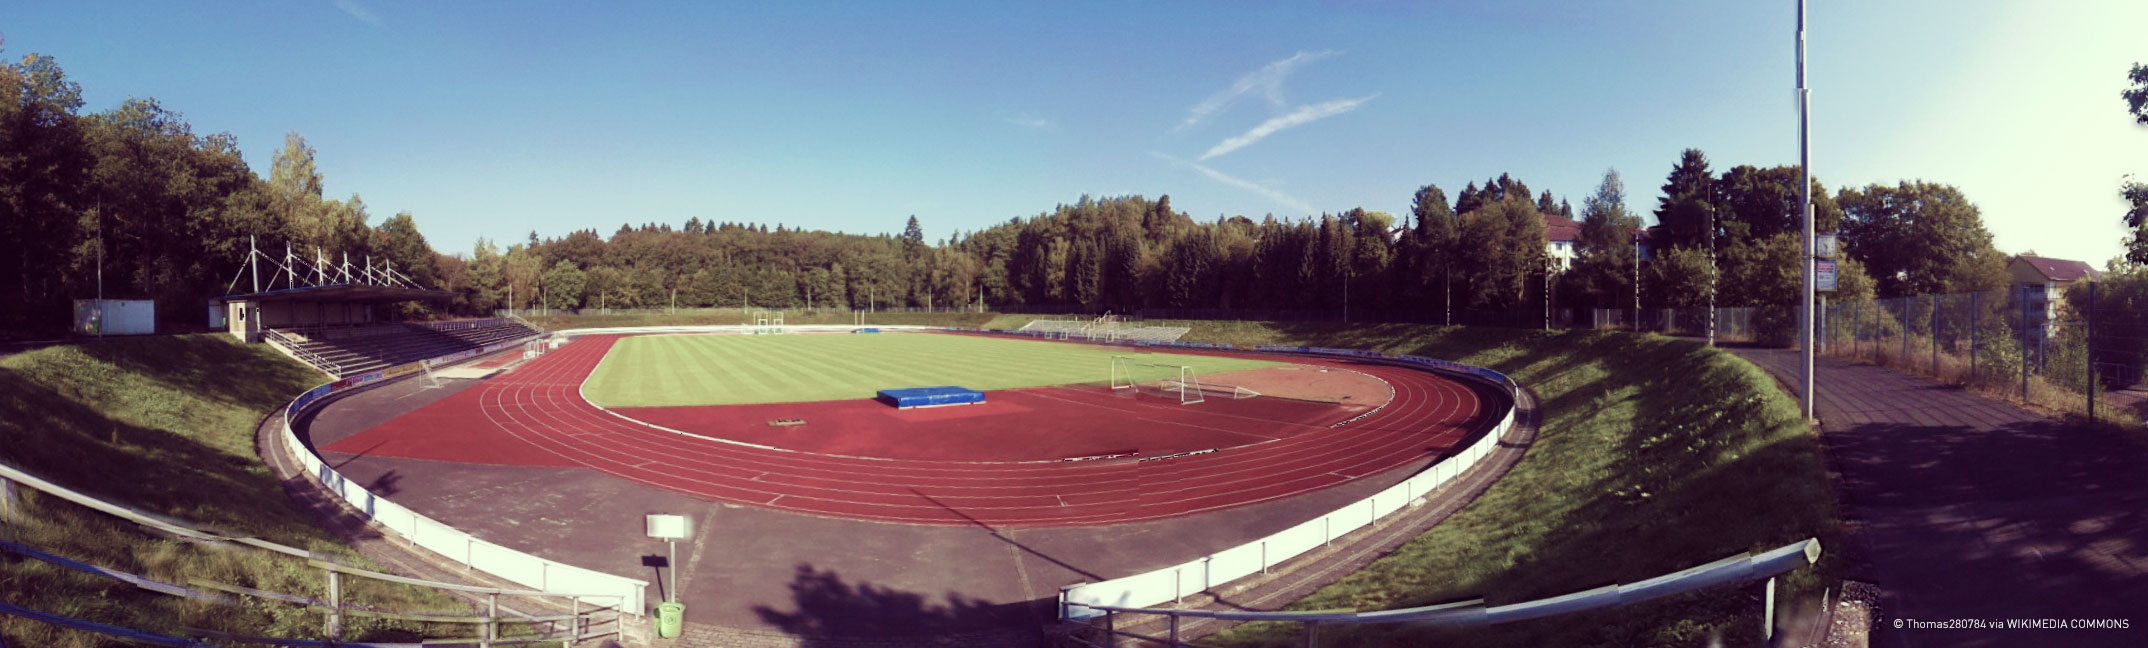 Hofbachstadion